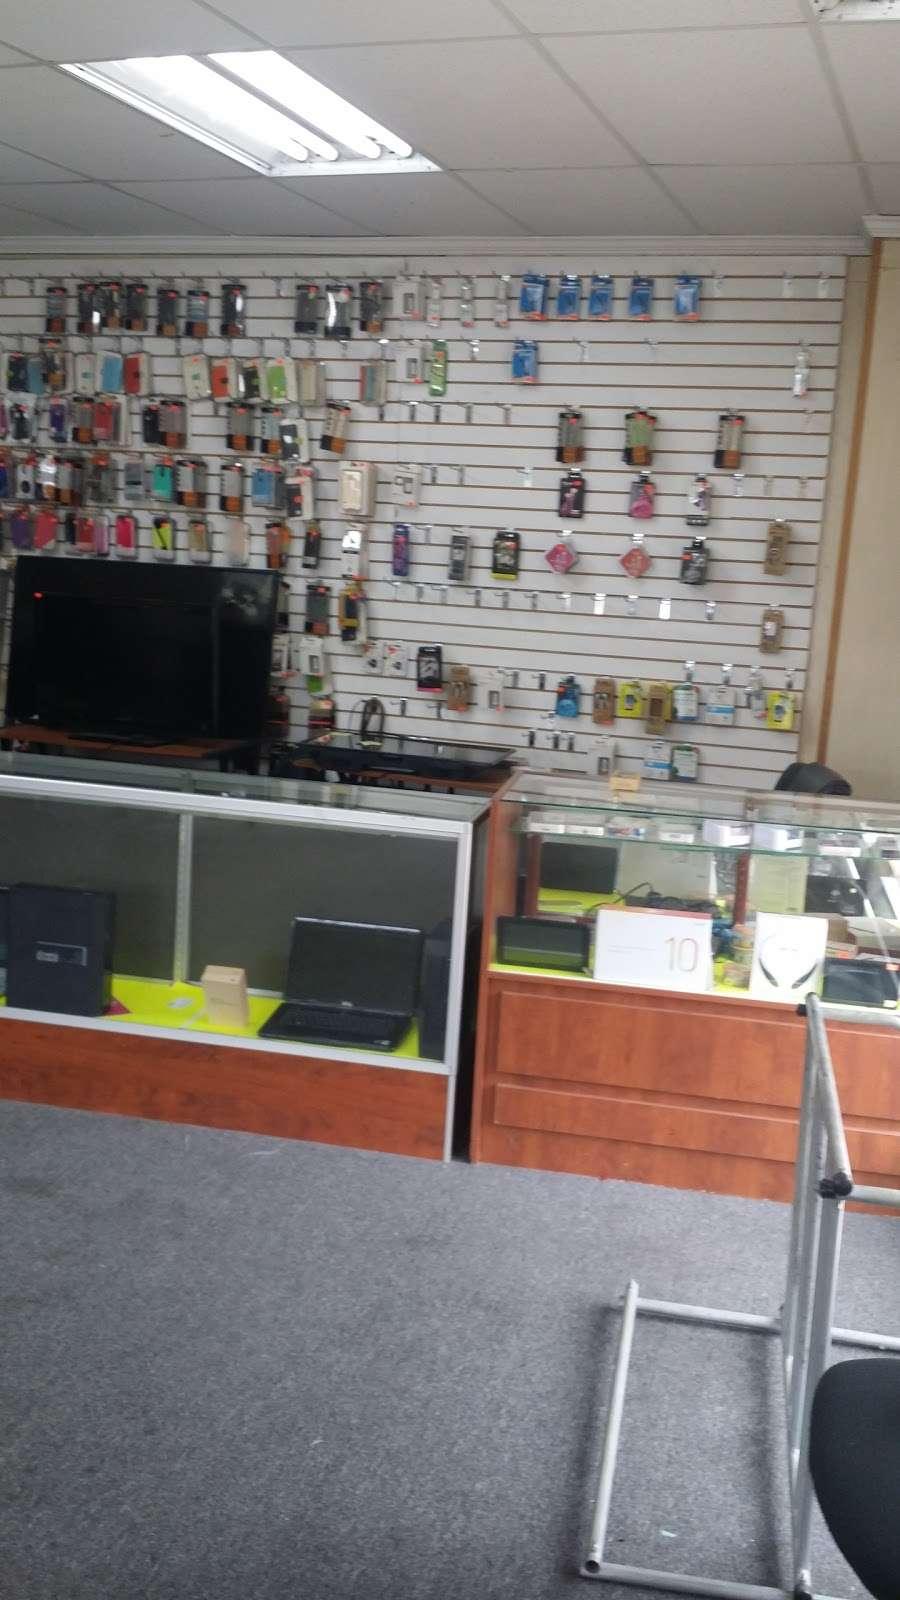 STAR GOLD & GEM - store  | Photo 1 of 10 | Address: 400 E Gun Hill Rd, Bronx, NY 10467, USA | Phone: (347) 346-4080